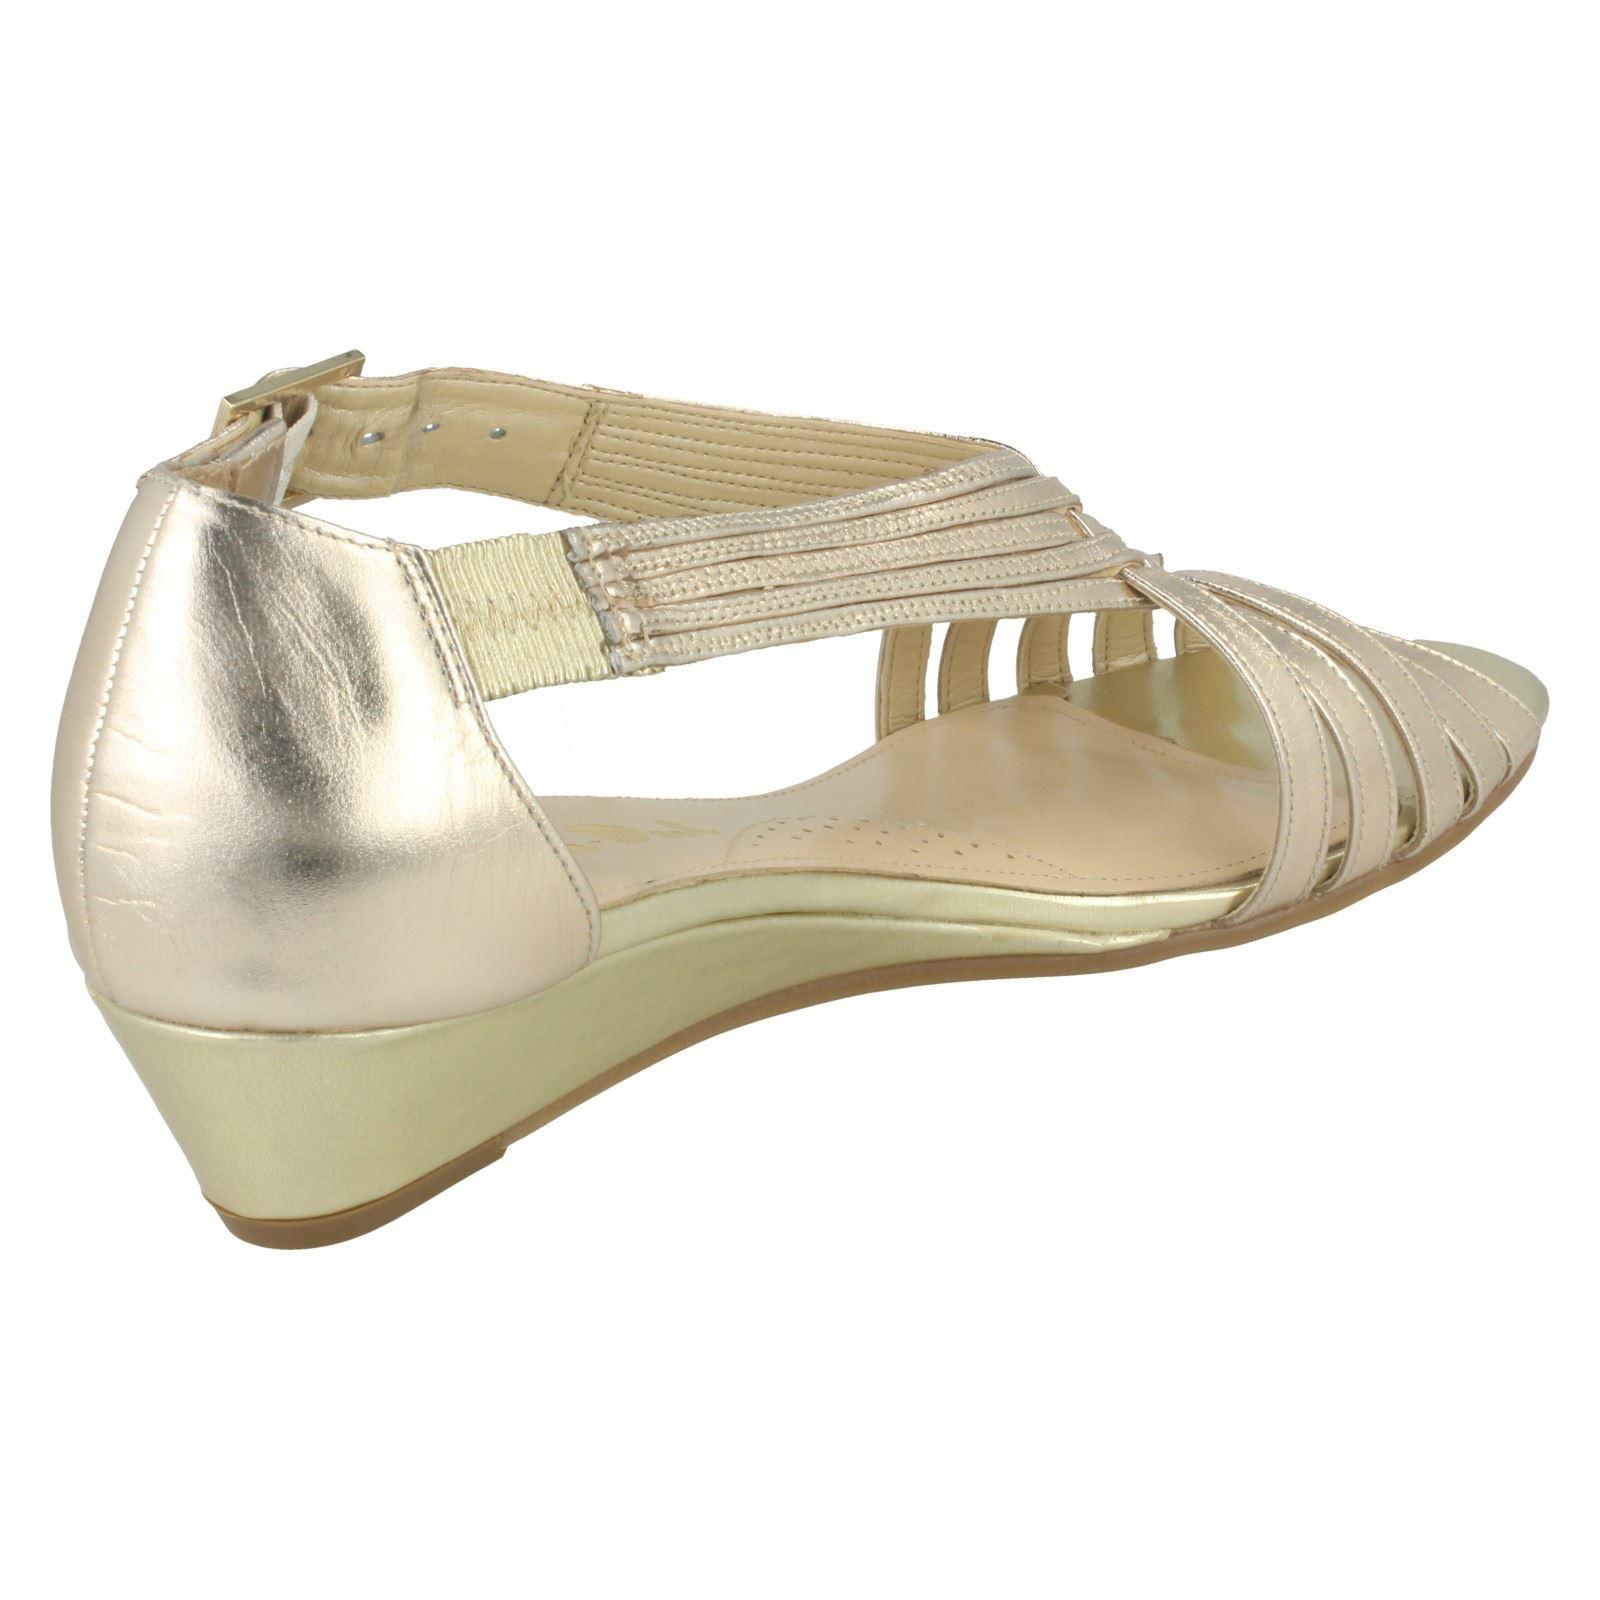 Ladies-Van-Dal-Wedge-Strappy-Sandals-Lucie thumbnail 25